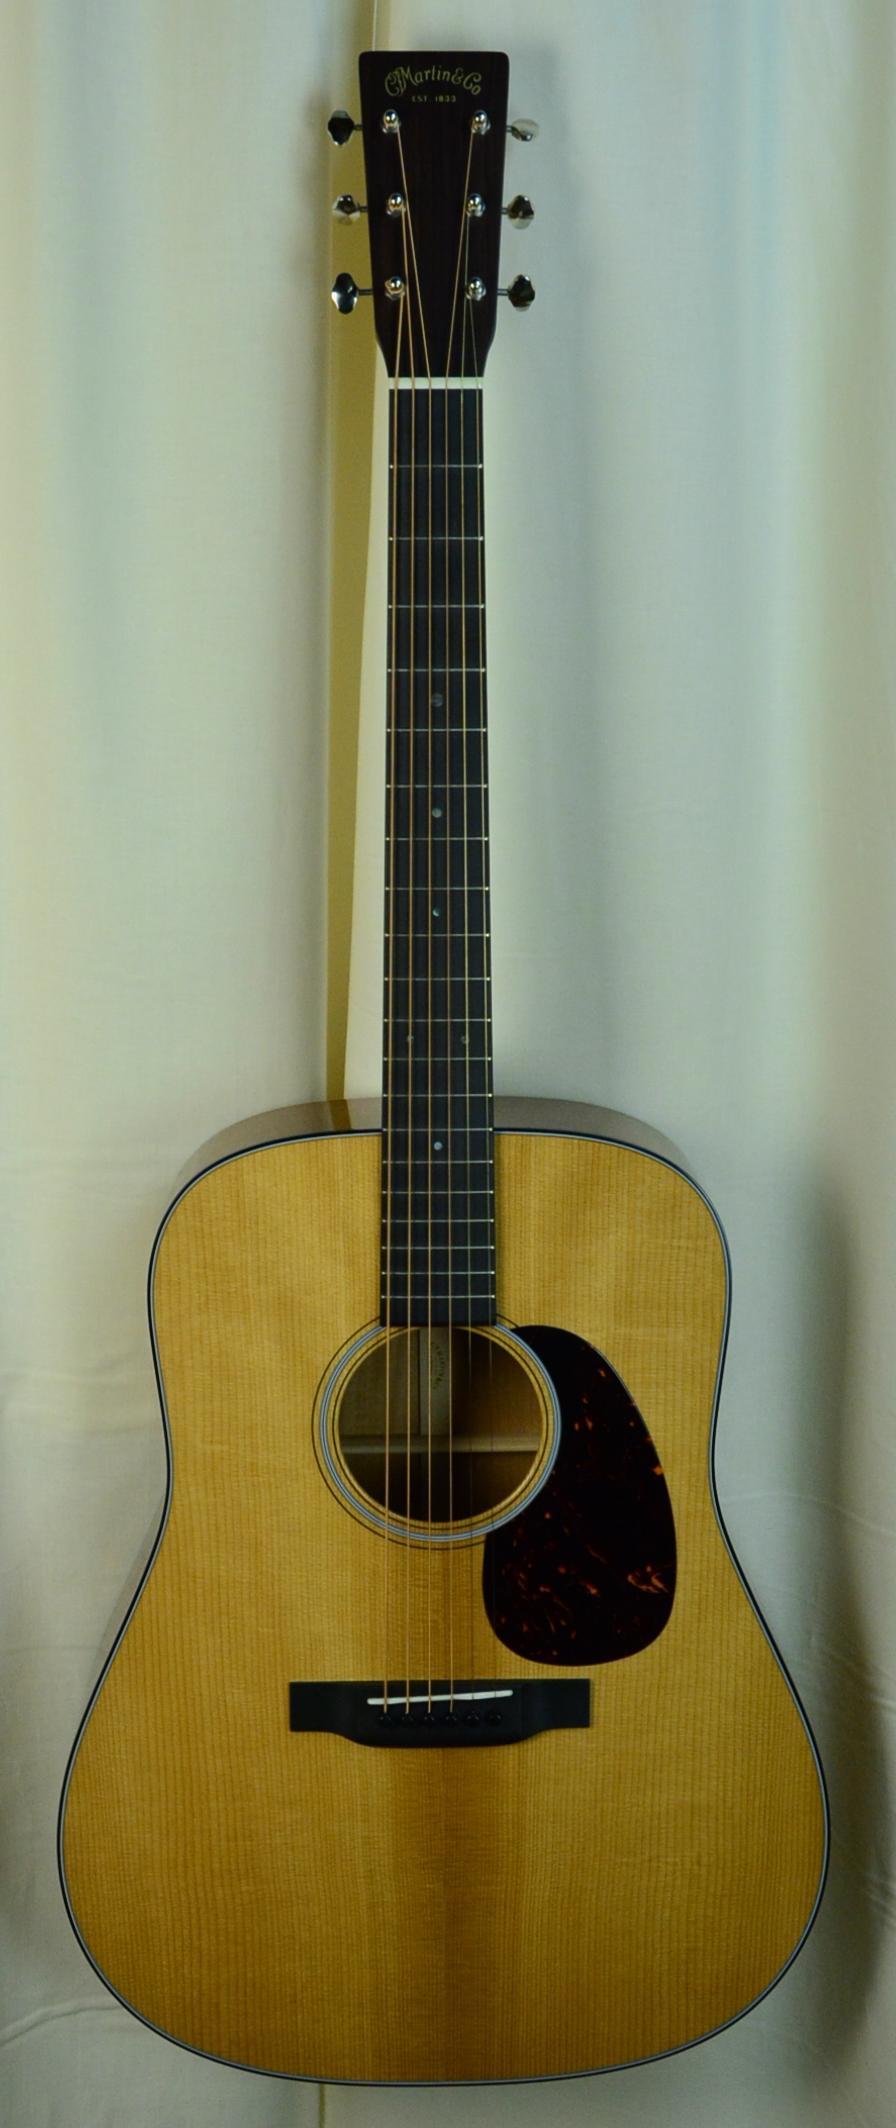 Q-2727524 S-1967573 D-18 Adi M1 (1).JPG